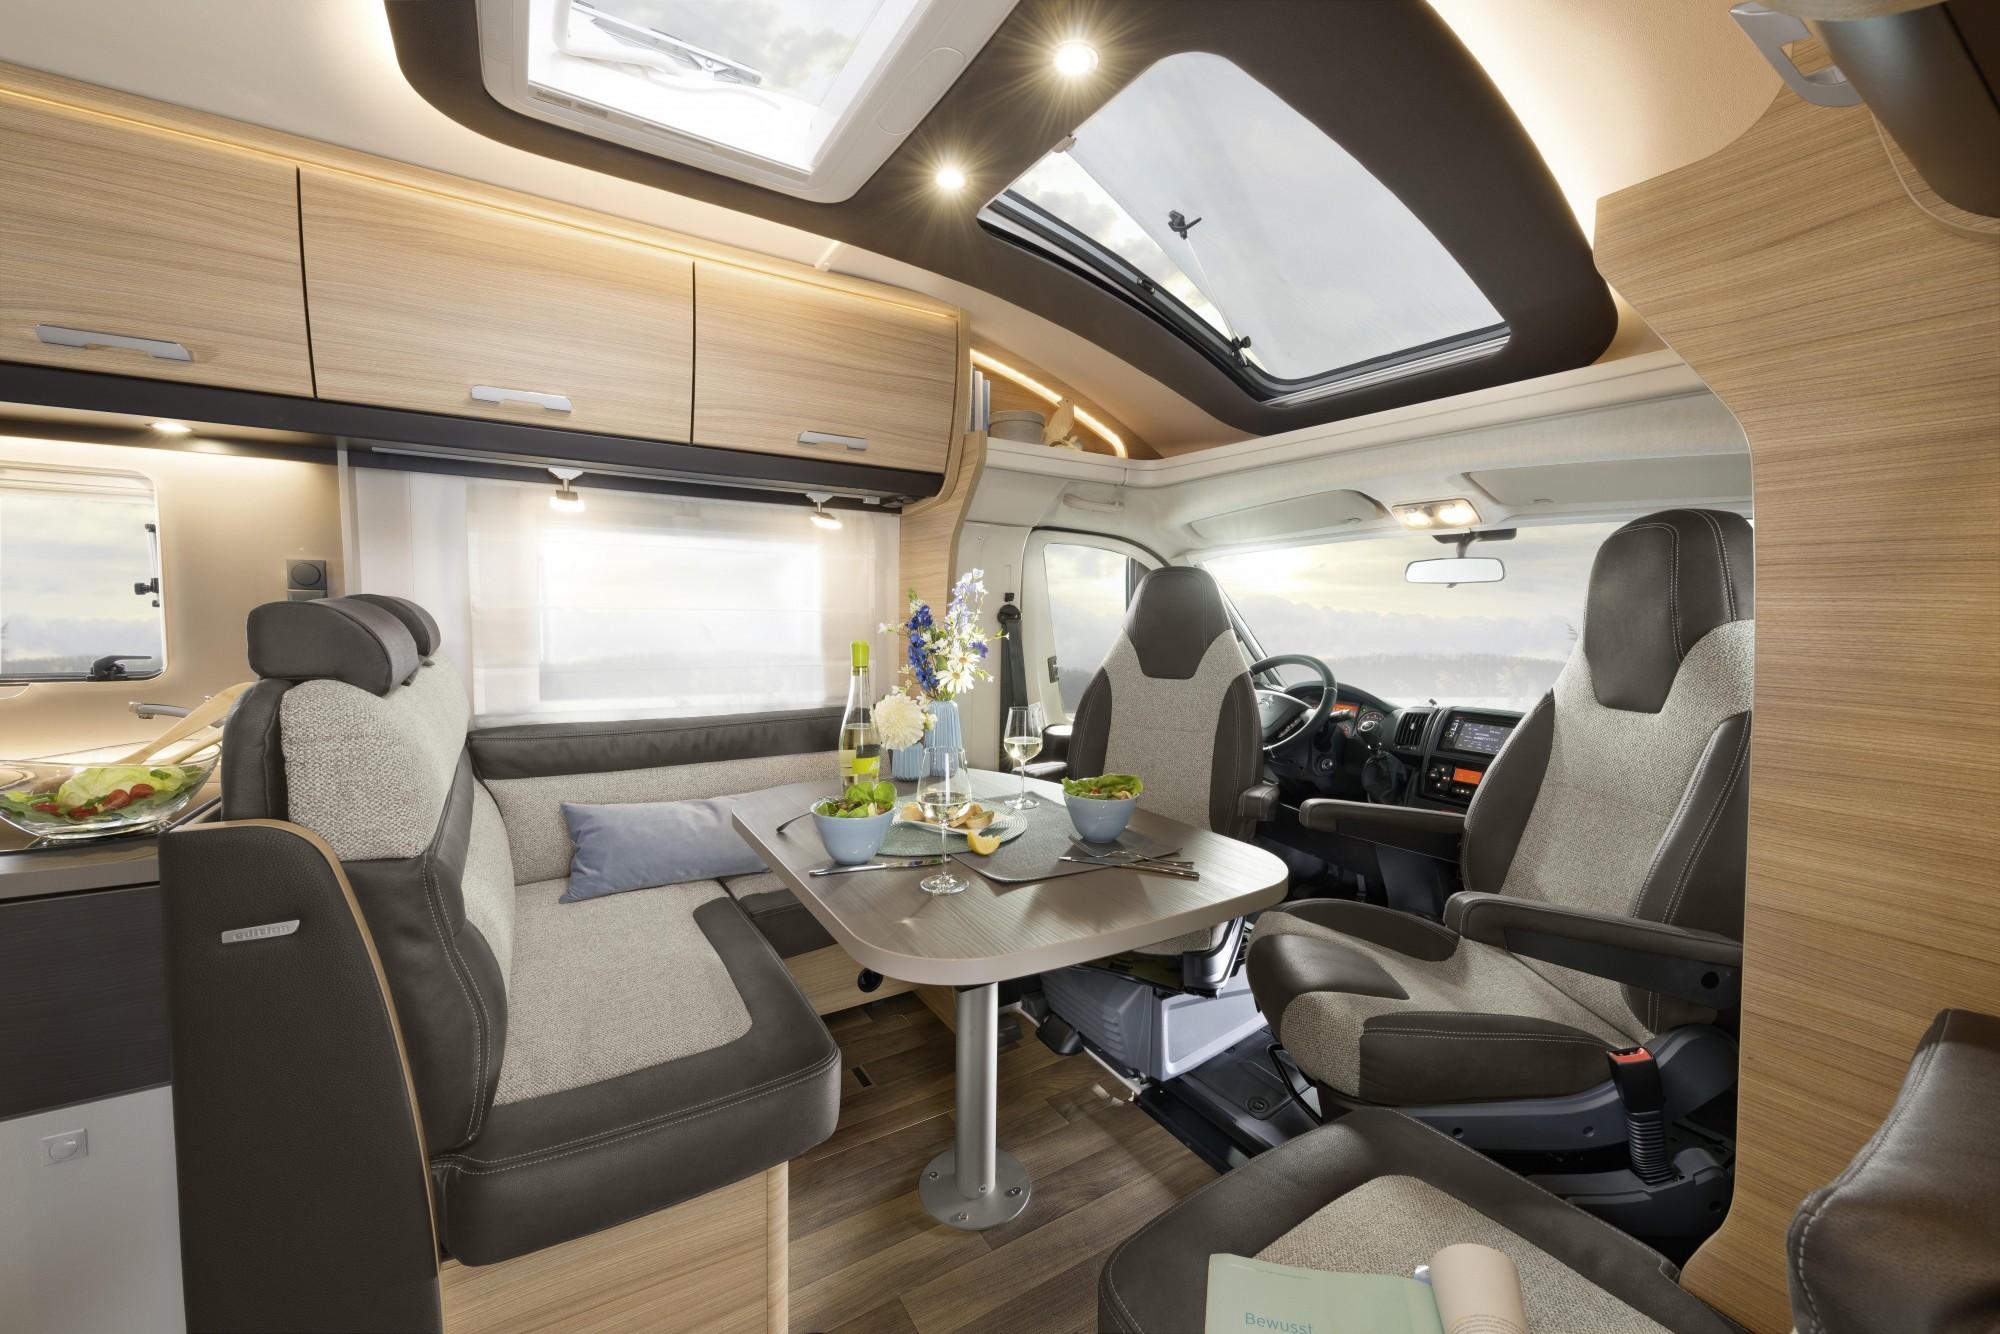 vends camping car dethleffs advantage t 7051 eb lit jumeaux 2018 st jean du cardonnay 76150. Black Bedroom Furniture Sets. Home Design Ideas